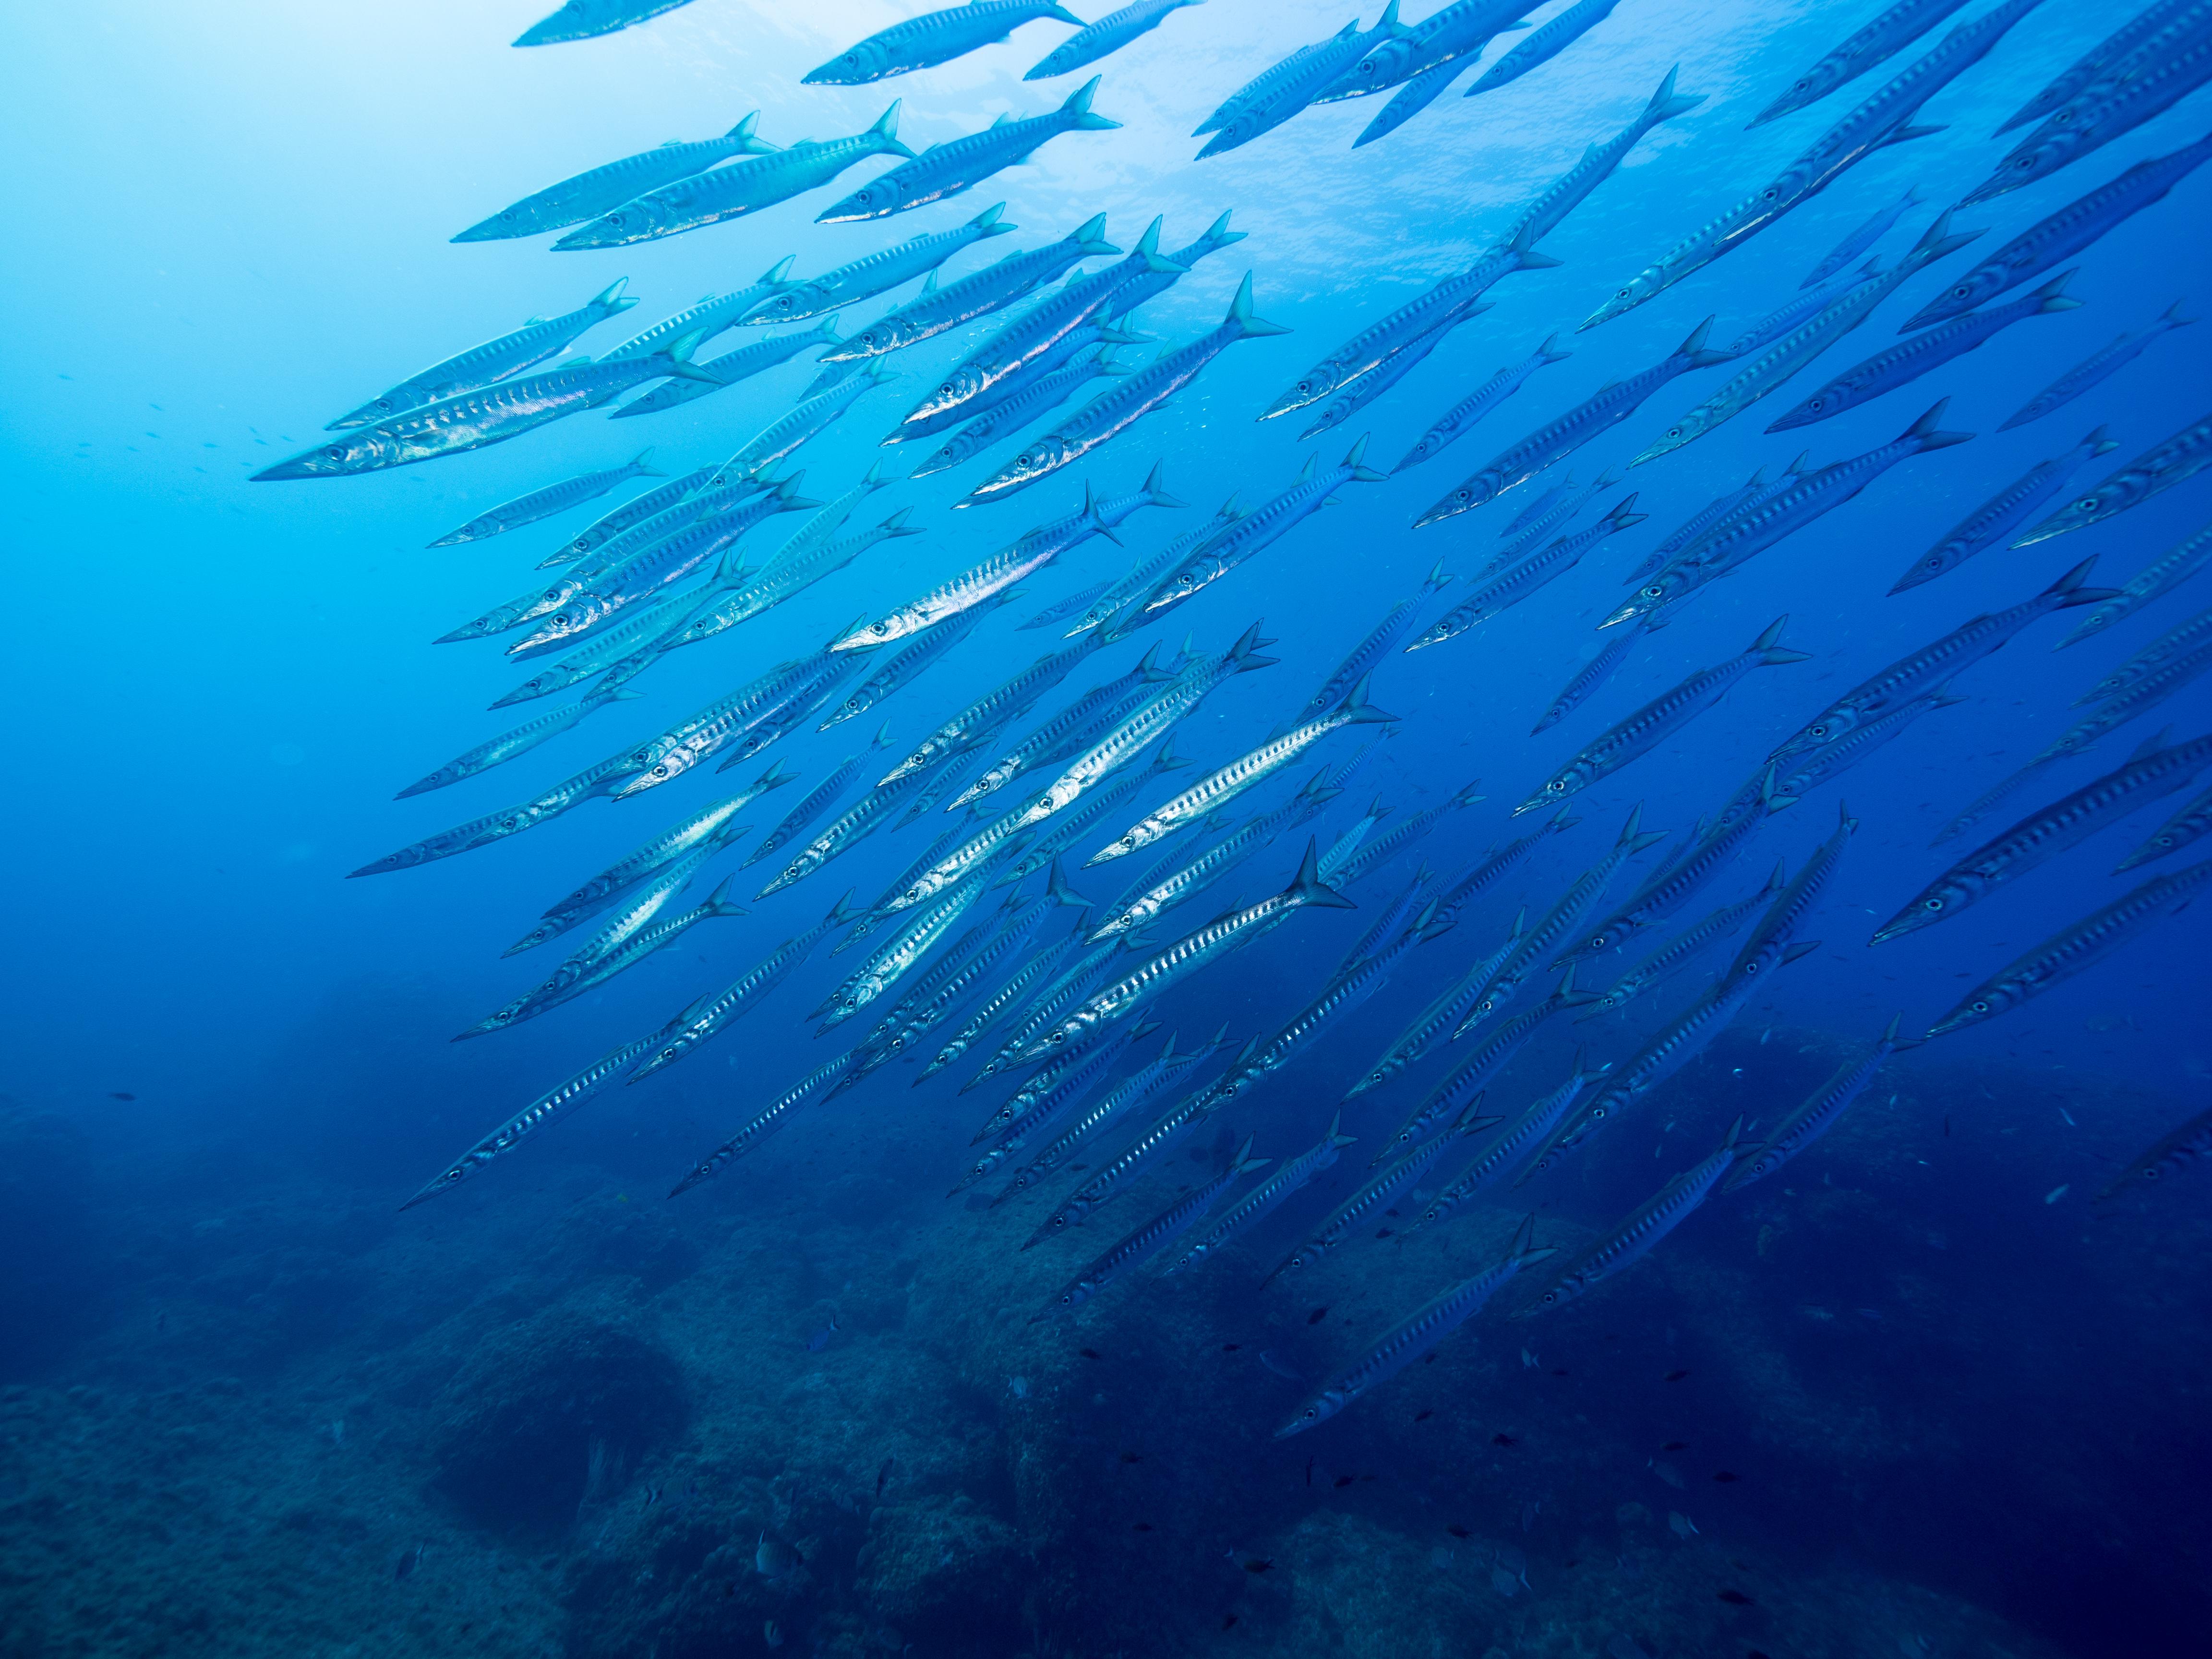 Illes Medes / Medes Islands - Freediving, Snorkeling, La Sirena, Apnea